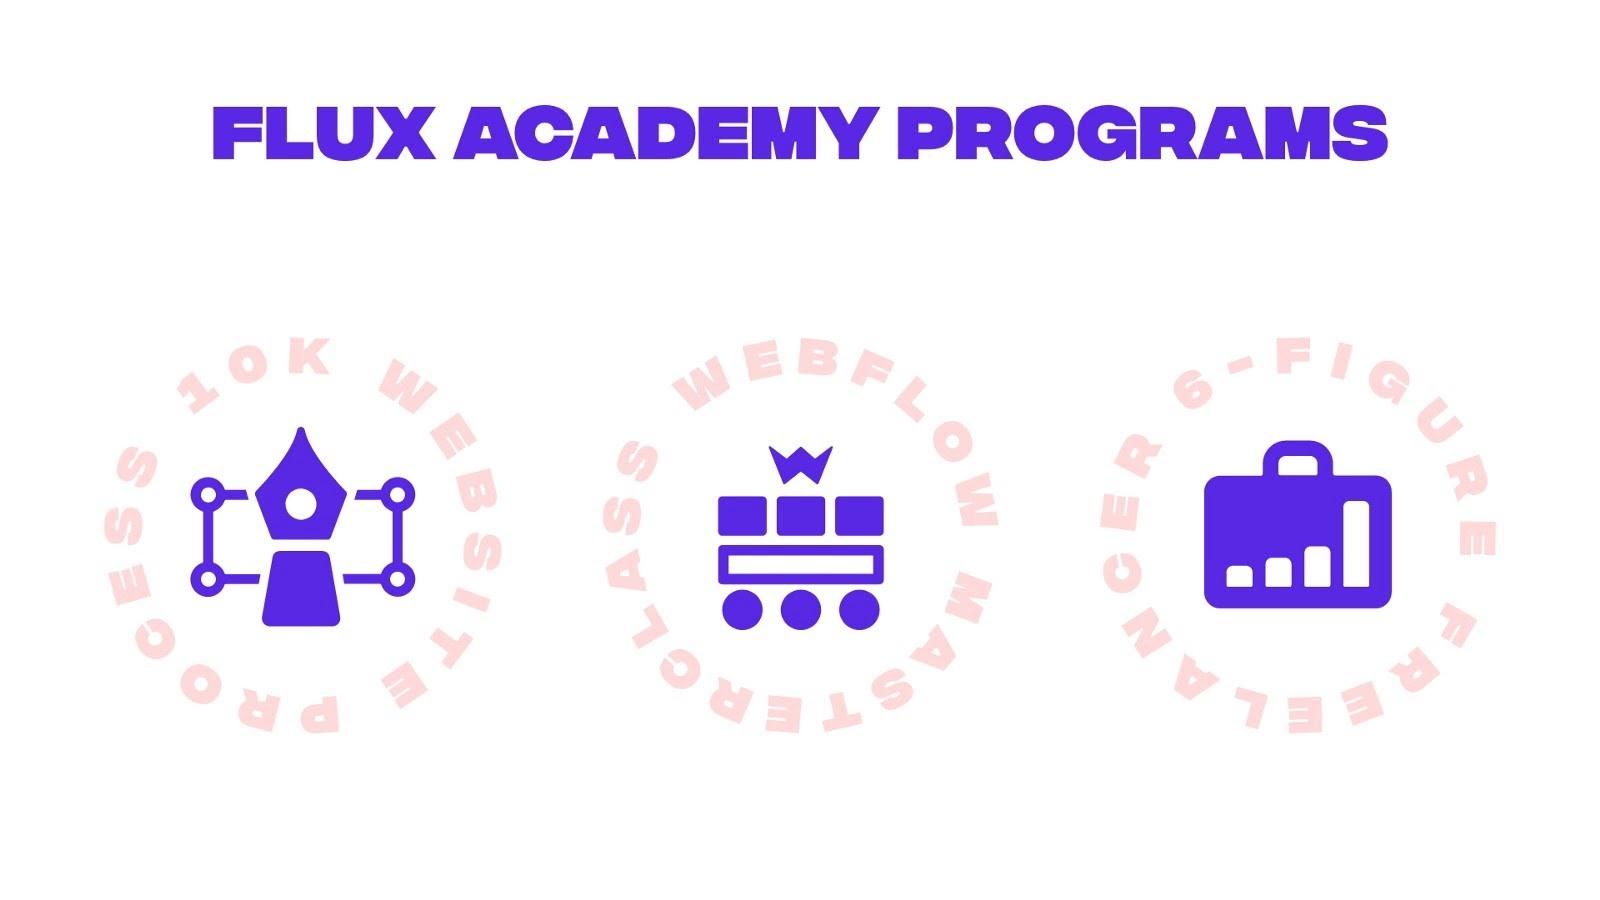 Flux Academy programs